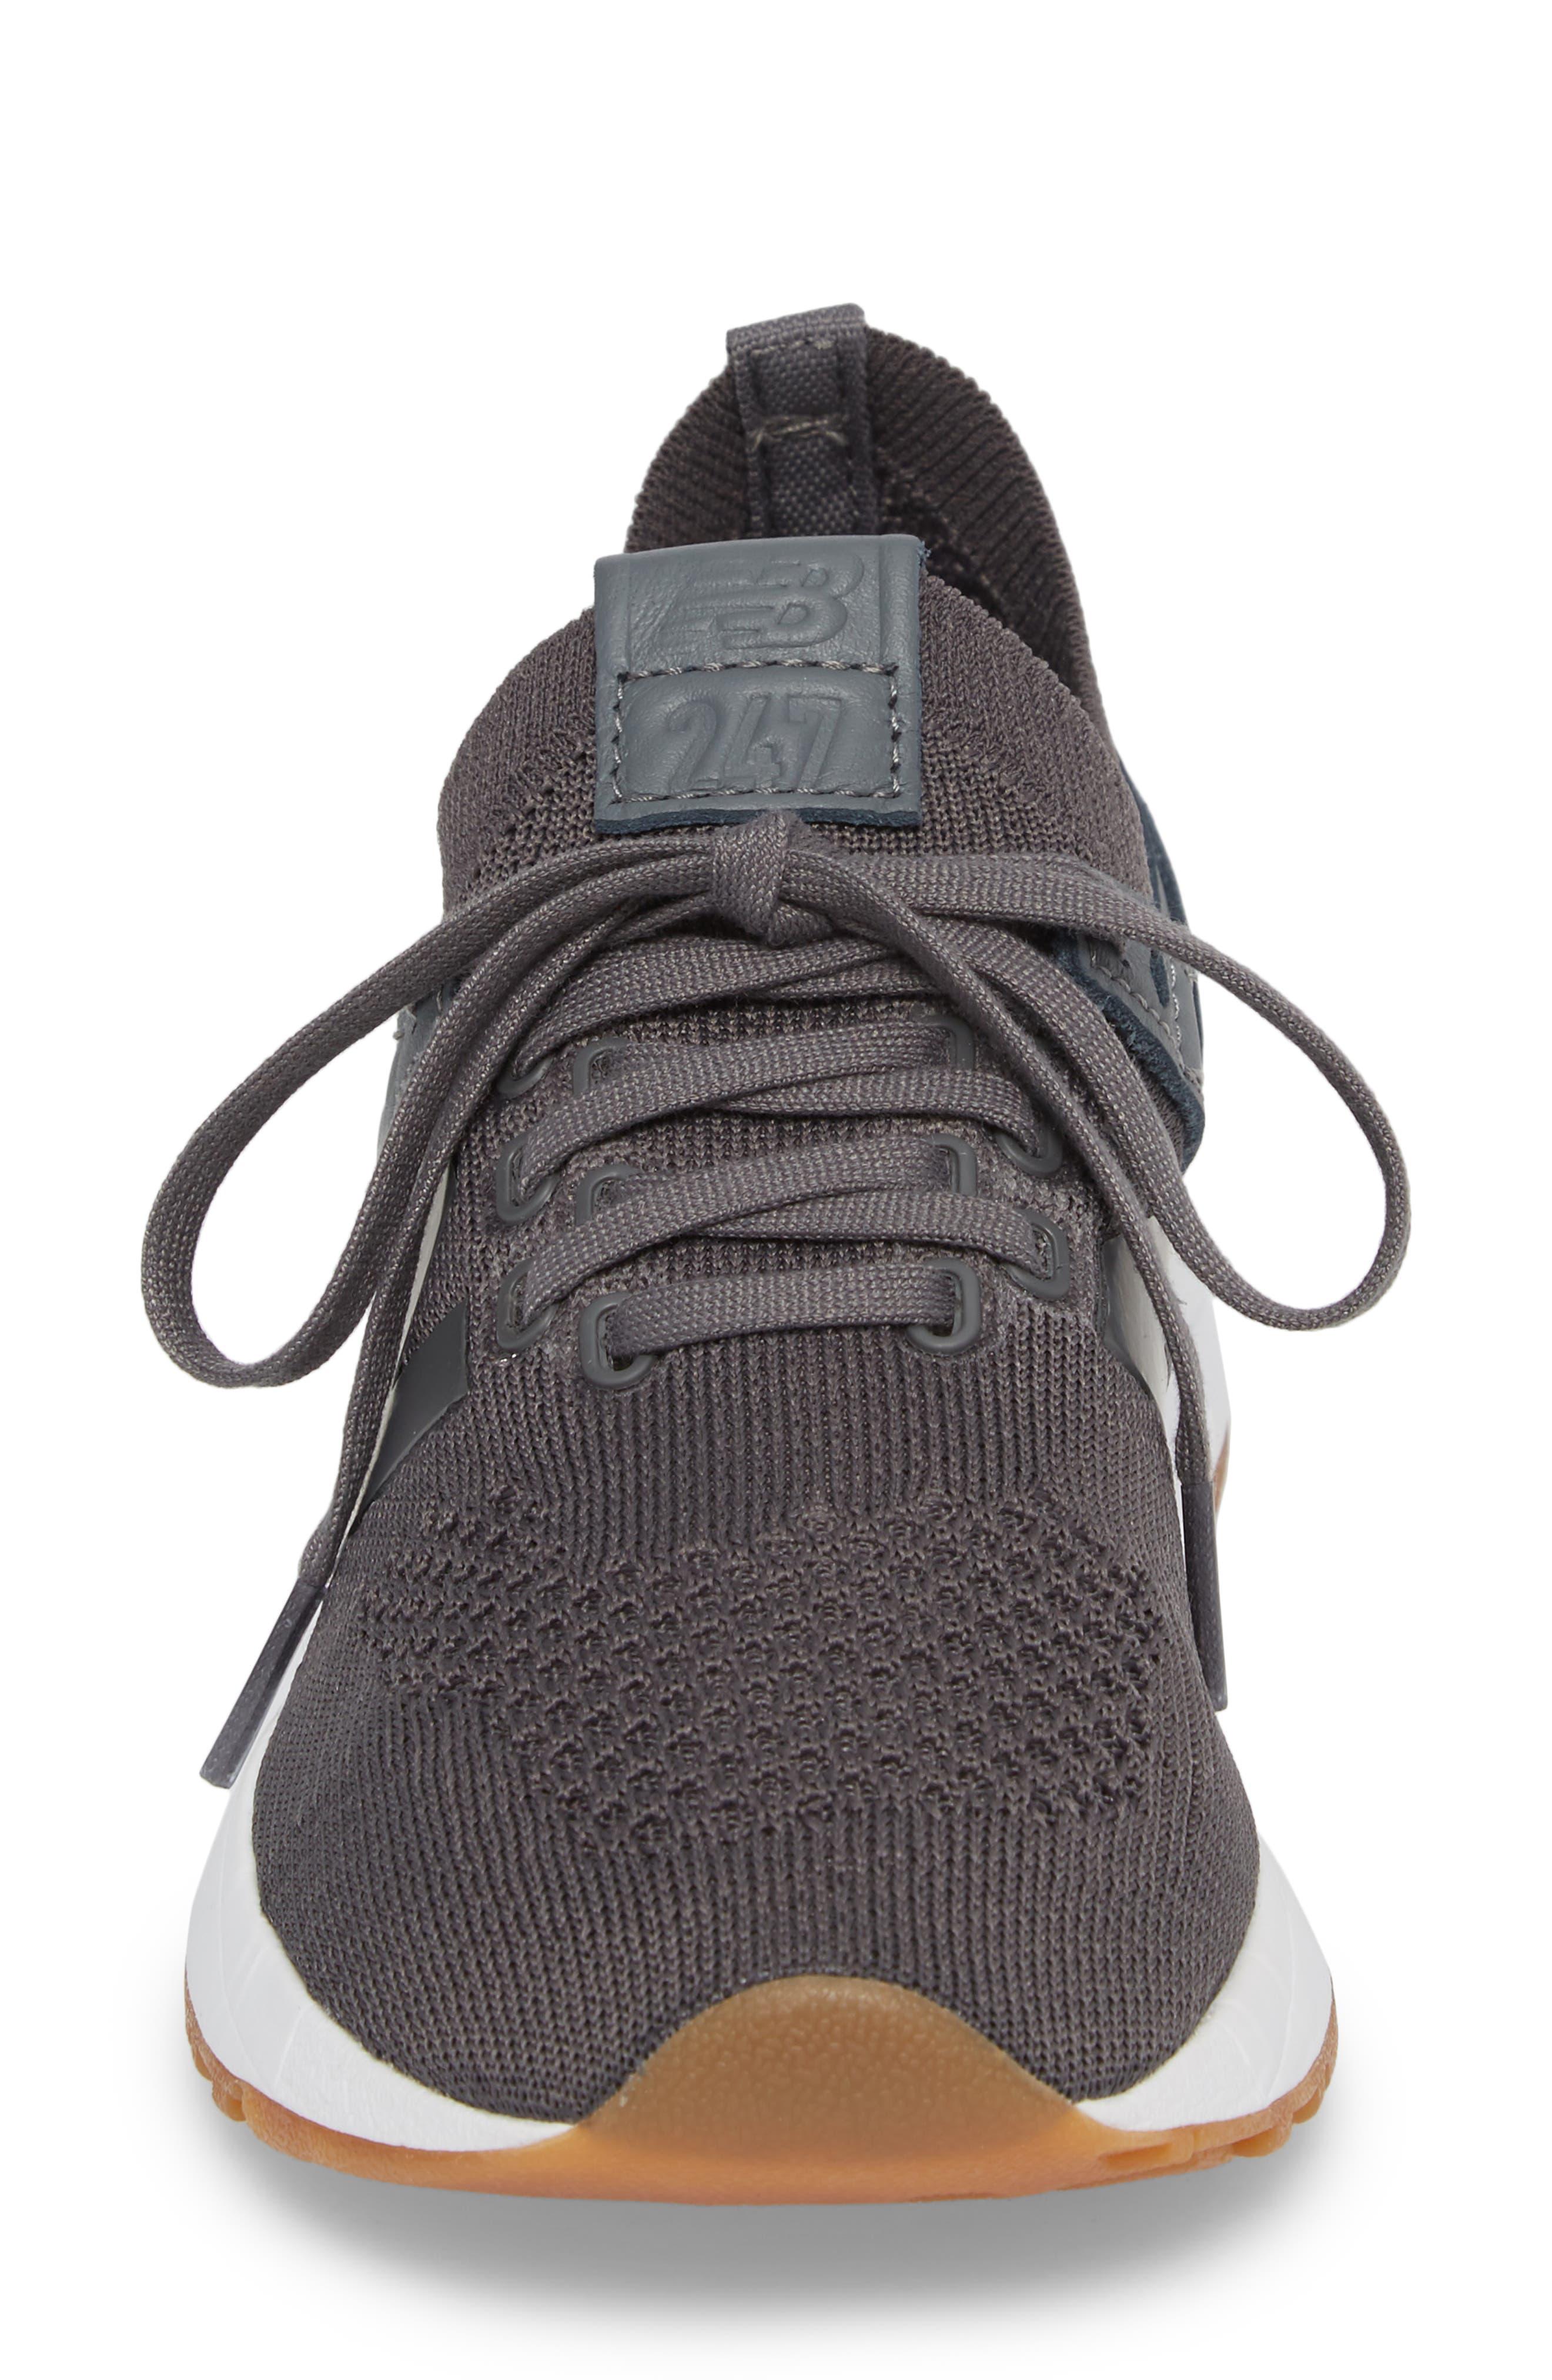 247 Decon Knit Sneaker,                             Alternate thumbnail 4, color,                             030